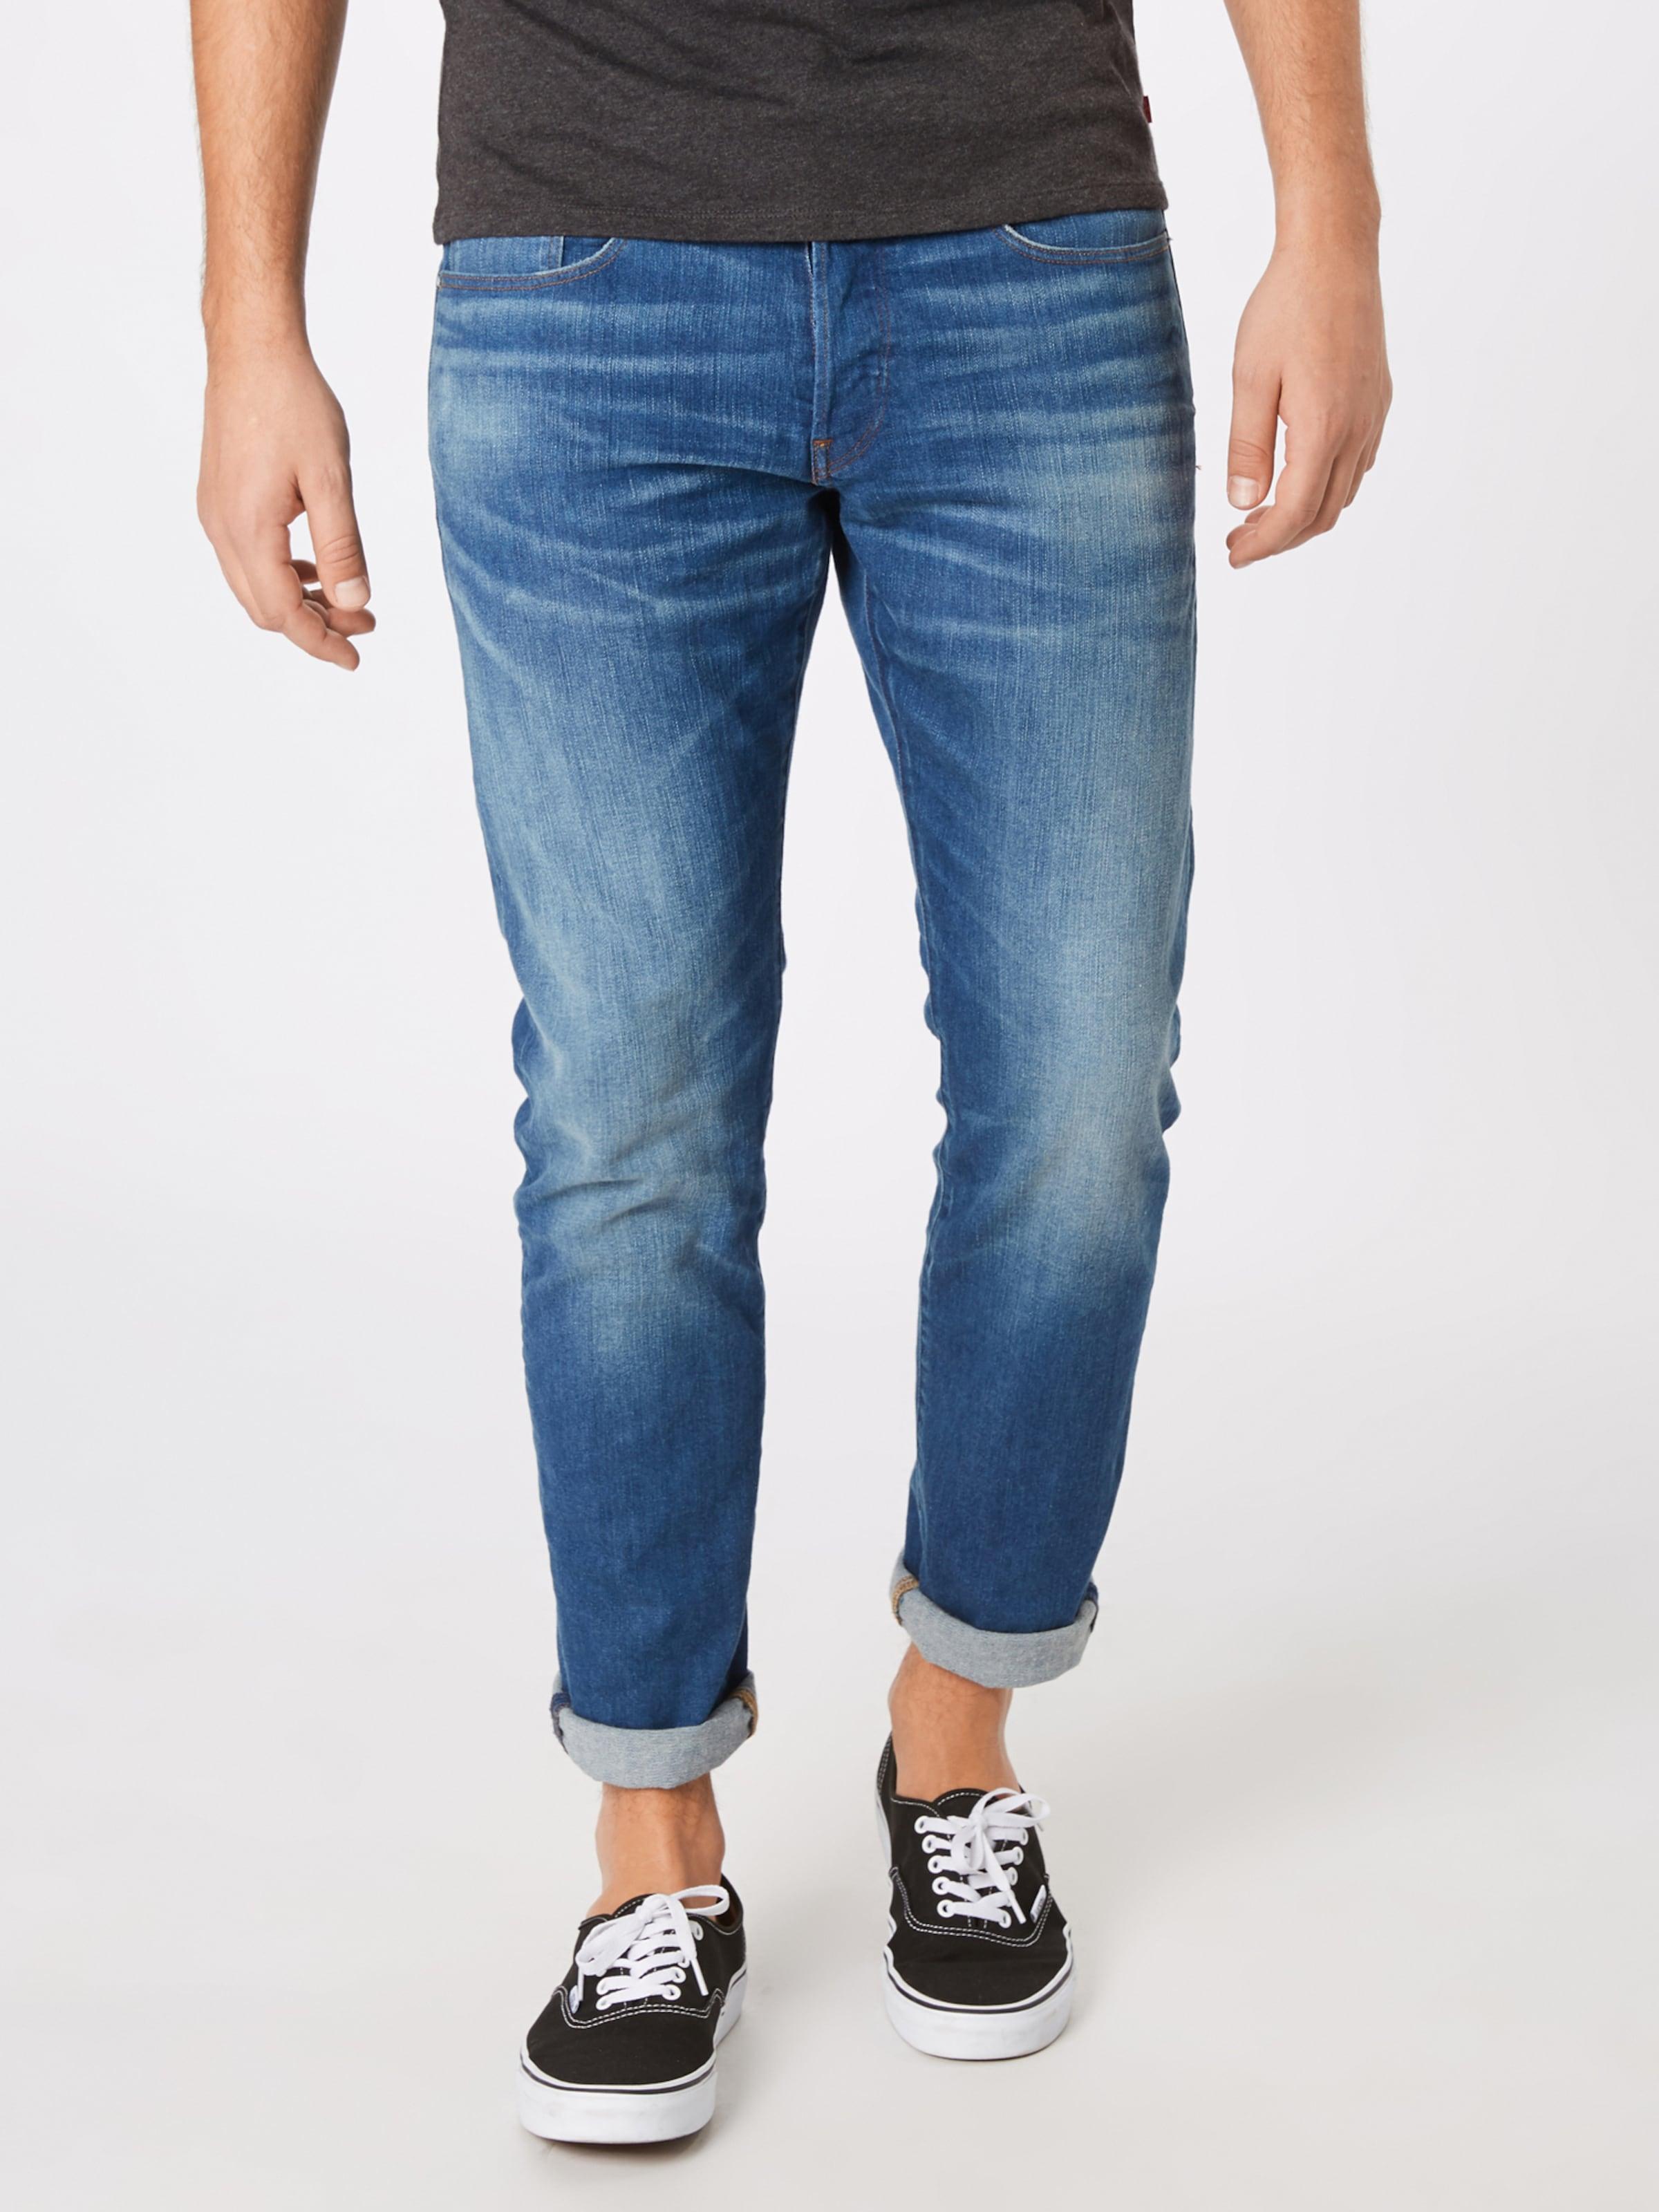 Raw In Jeans '3301 Denim star Tapered' G Blue 29beEHIWDY